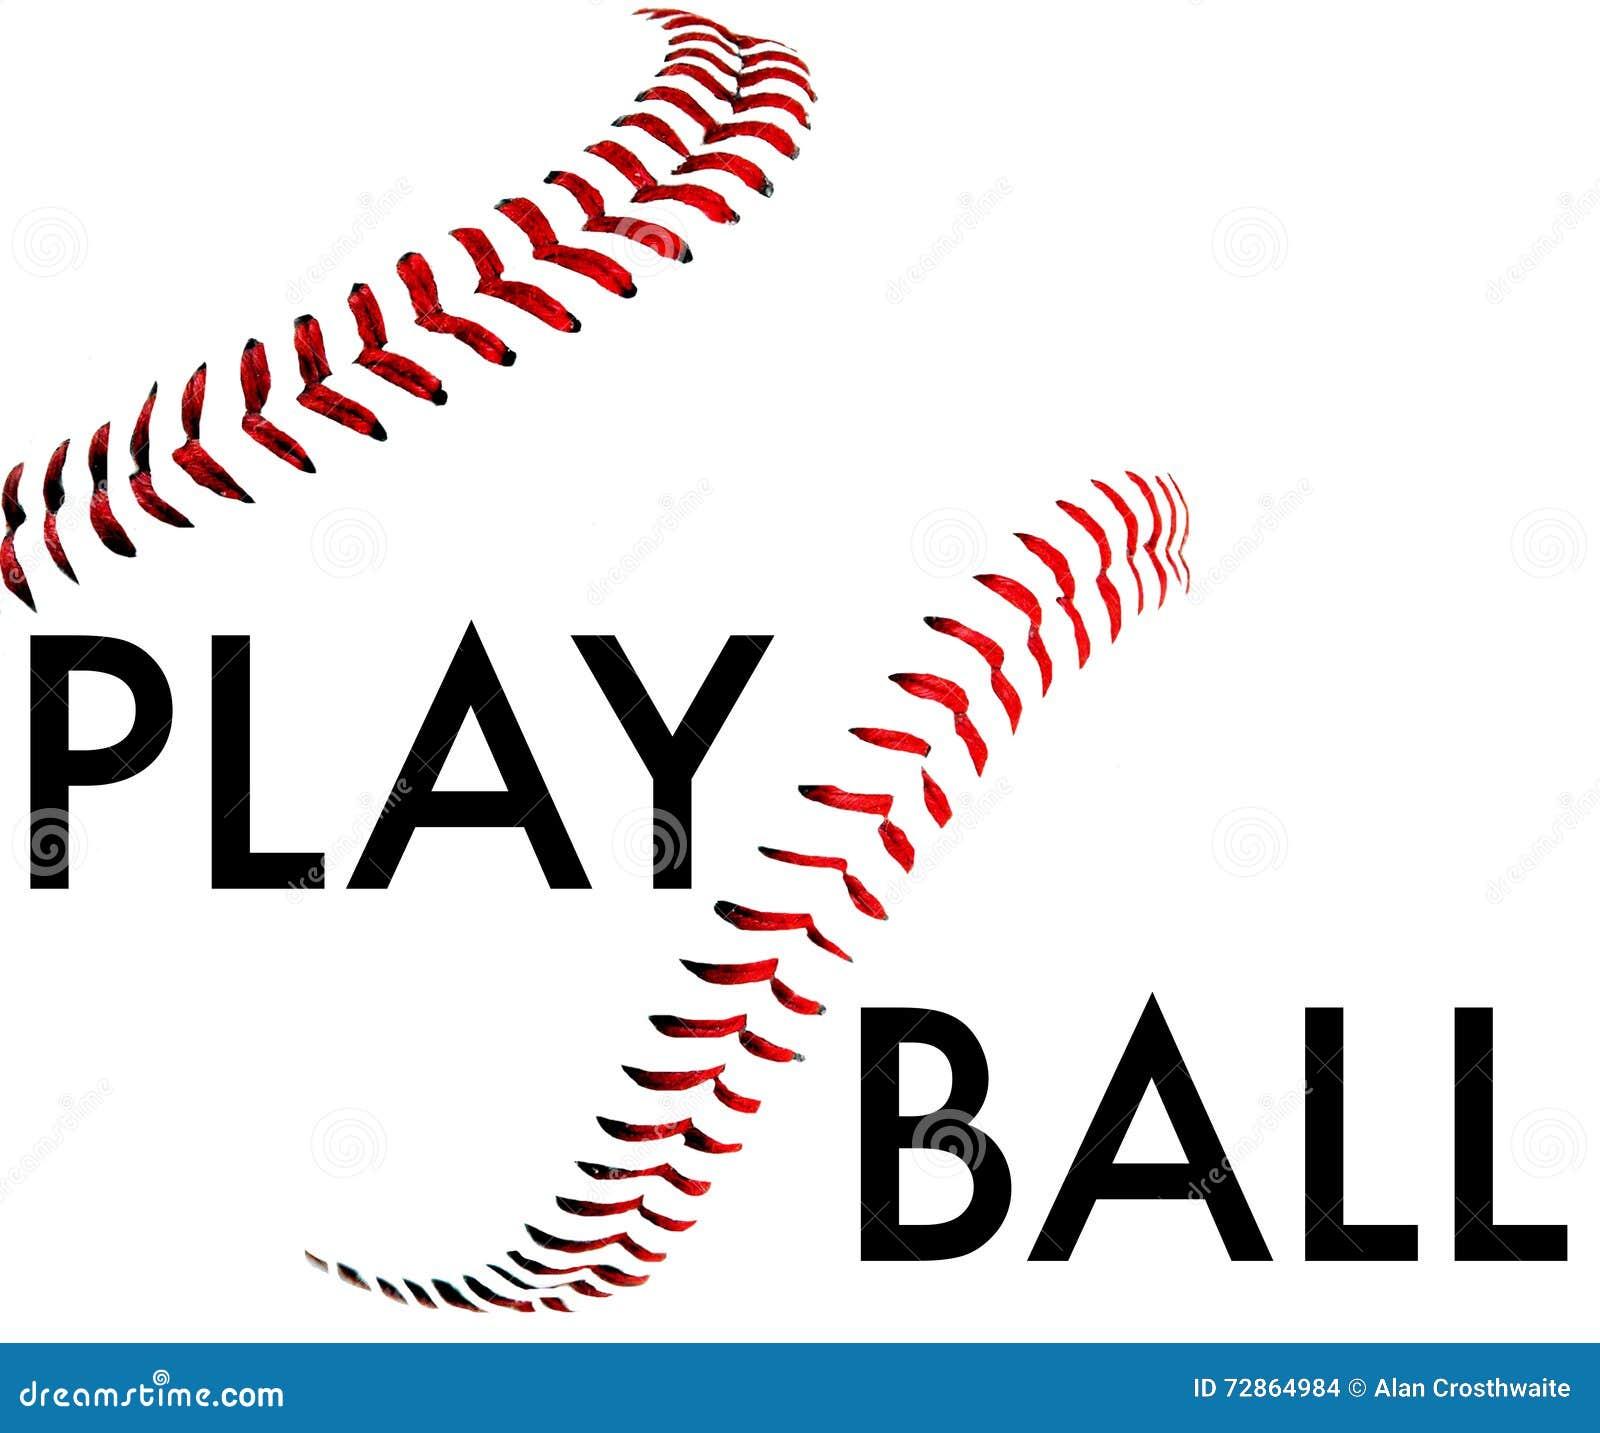 play ball stock illustration illustration of play team